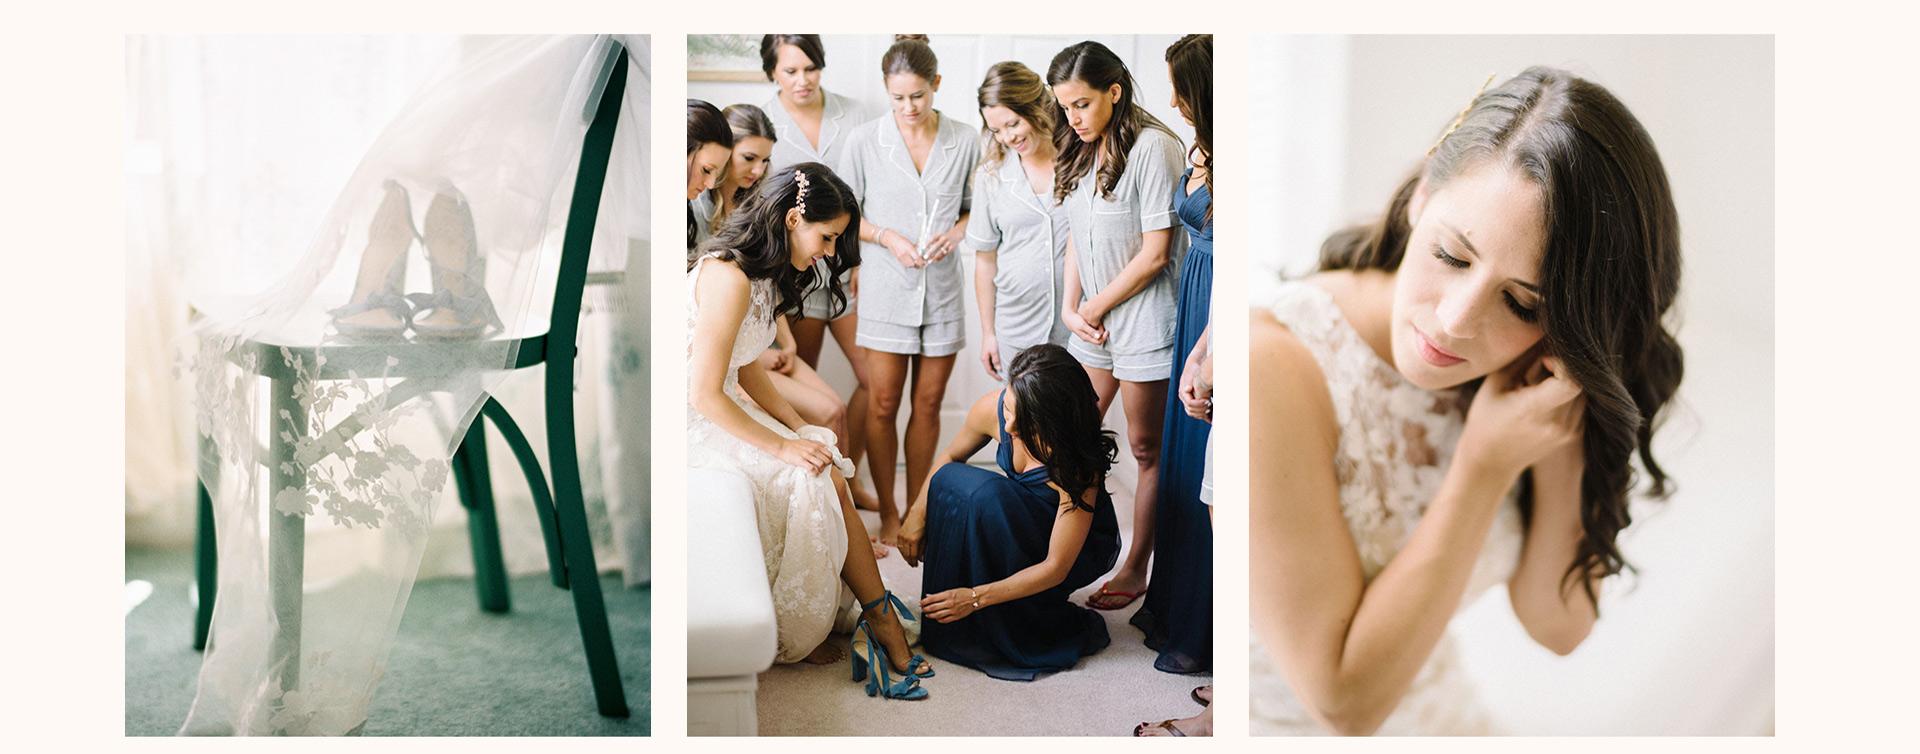 03 gurneys montauk wedding photographer - GURNEYS WEDDING - MONTAUK, NY